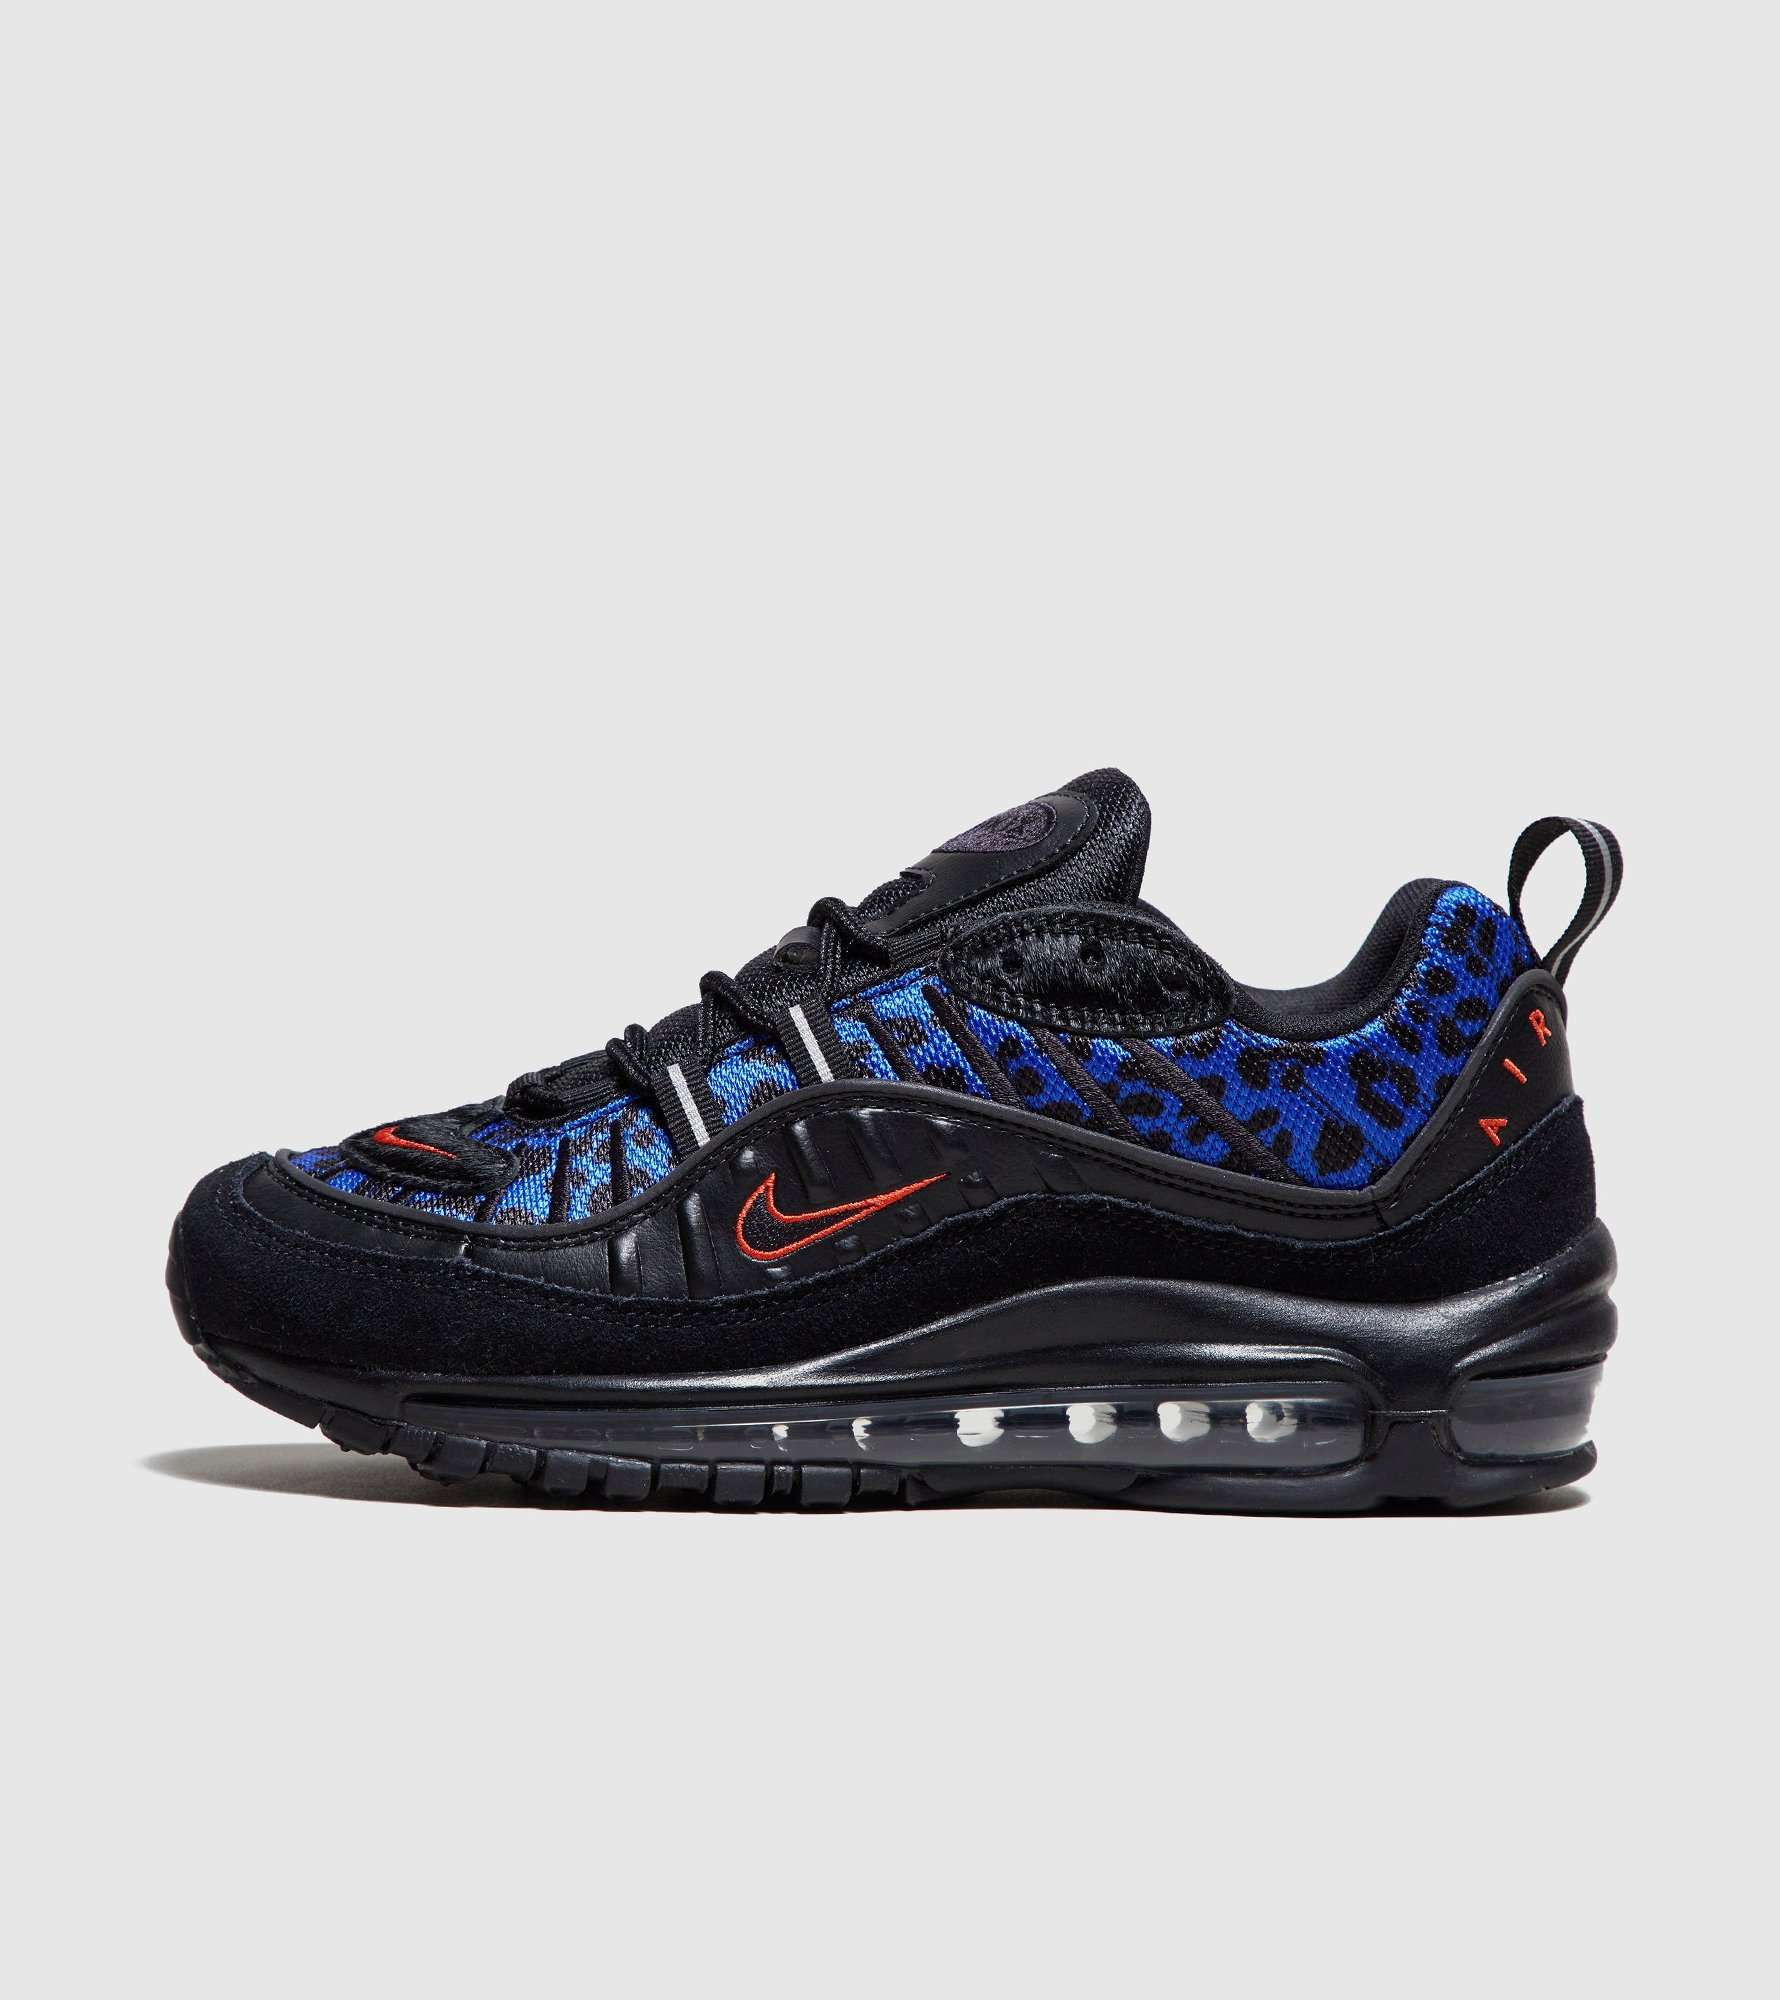 best website 51bf3 6a43f Nike Air Max 98 'Black Leopard' Women's | Size?